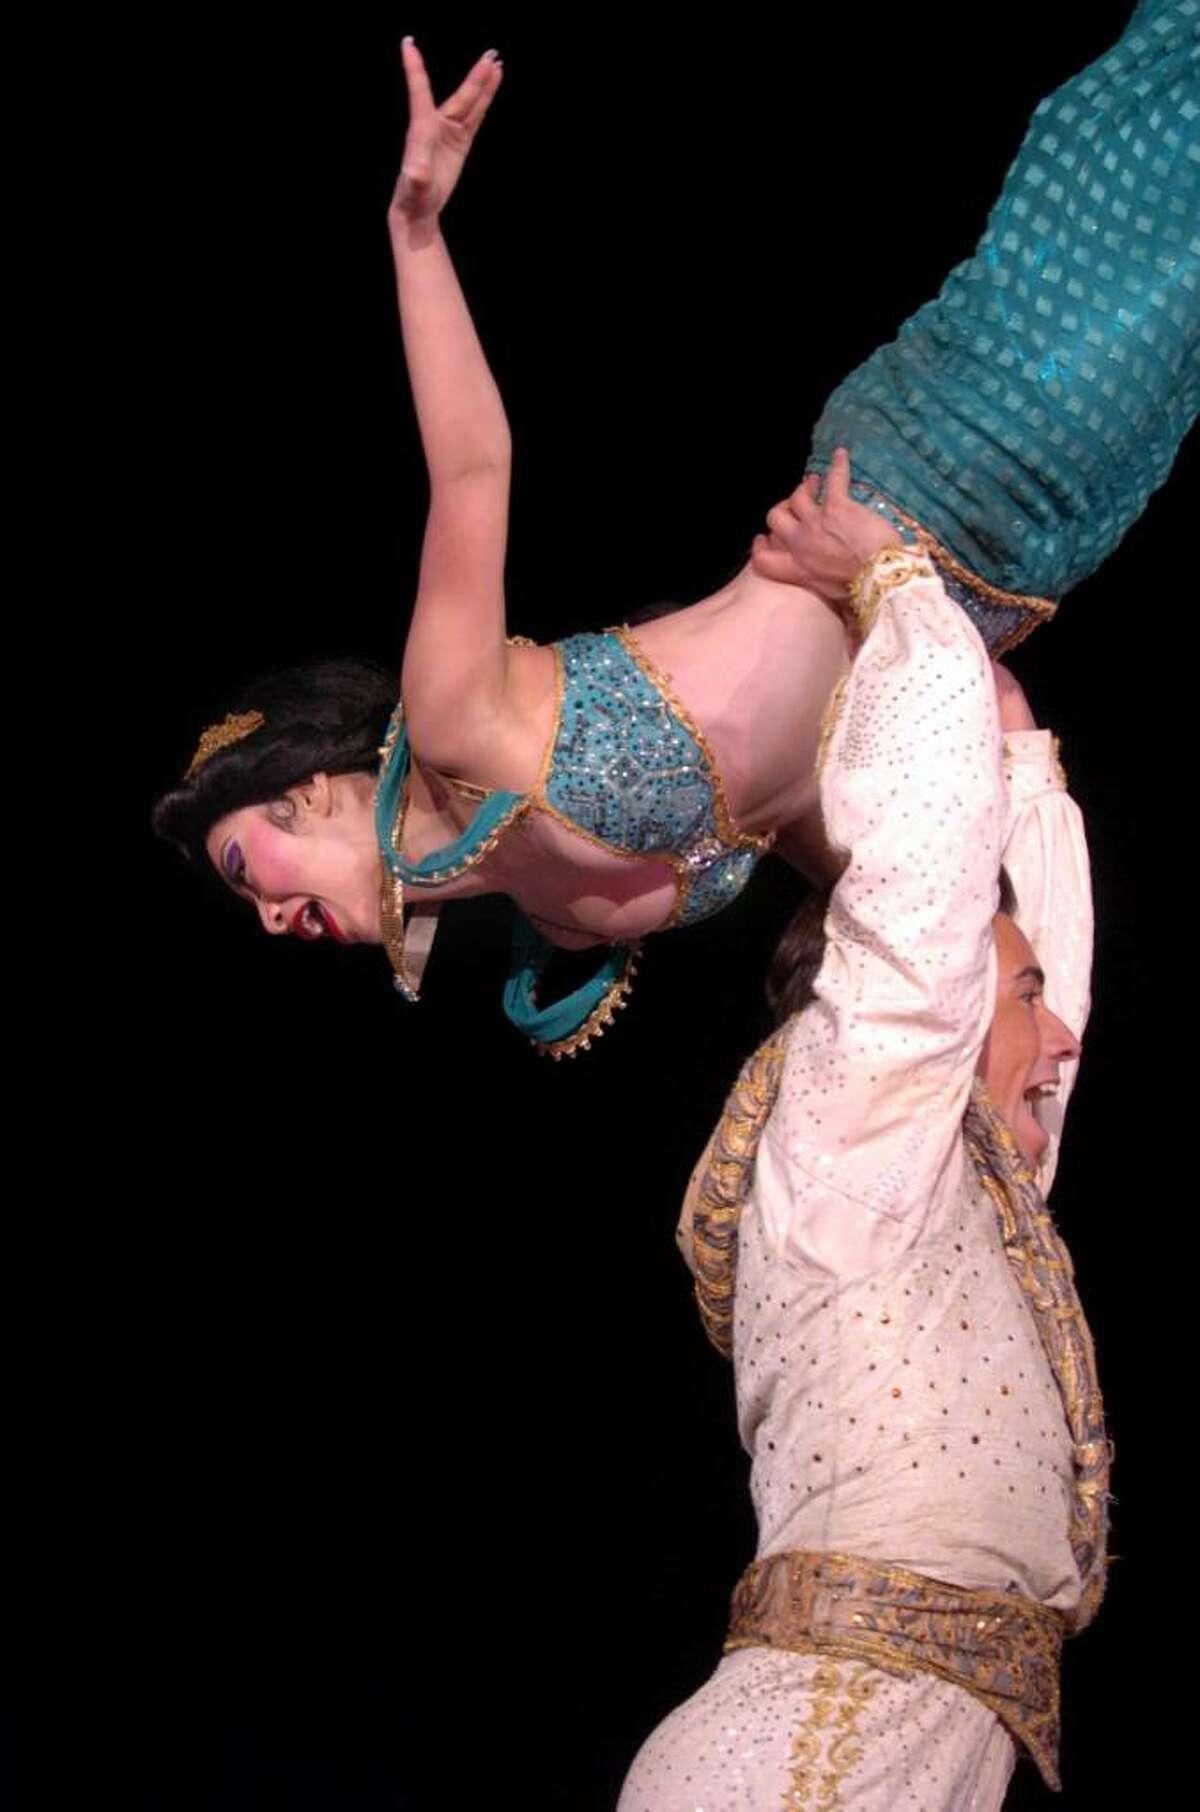 Princess Jasmine and Prince Ali, from